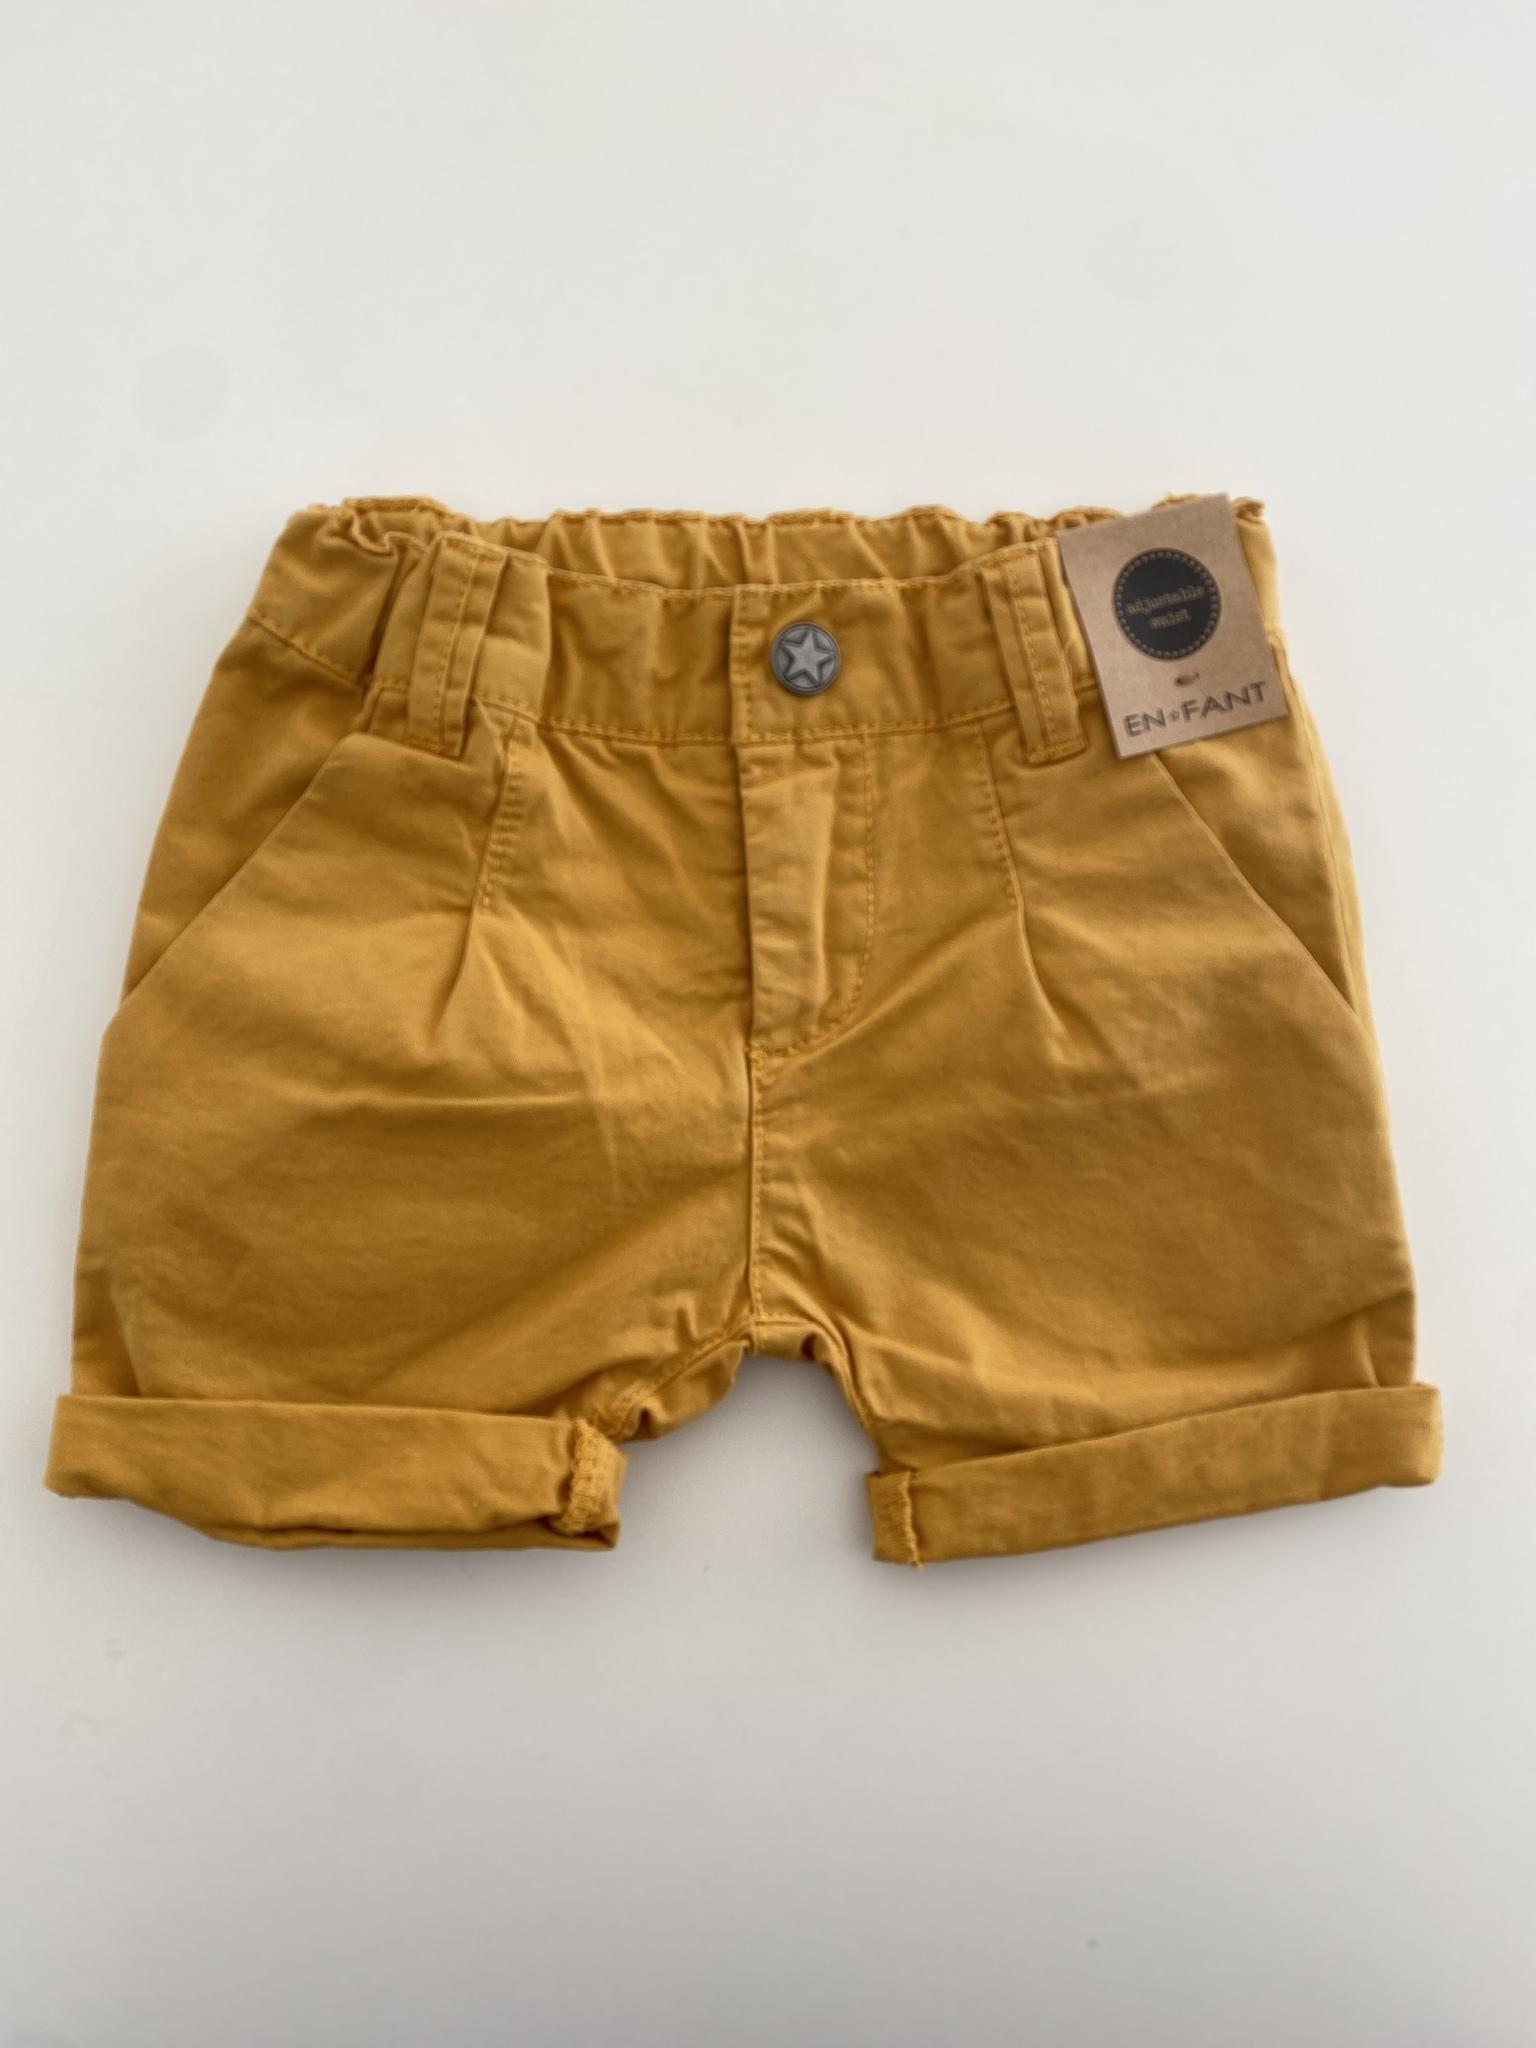 Shorts - Enfant